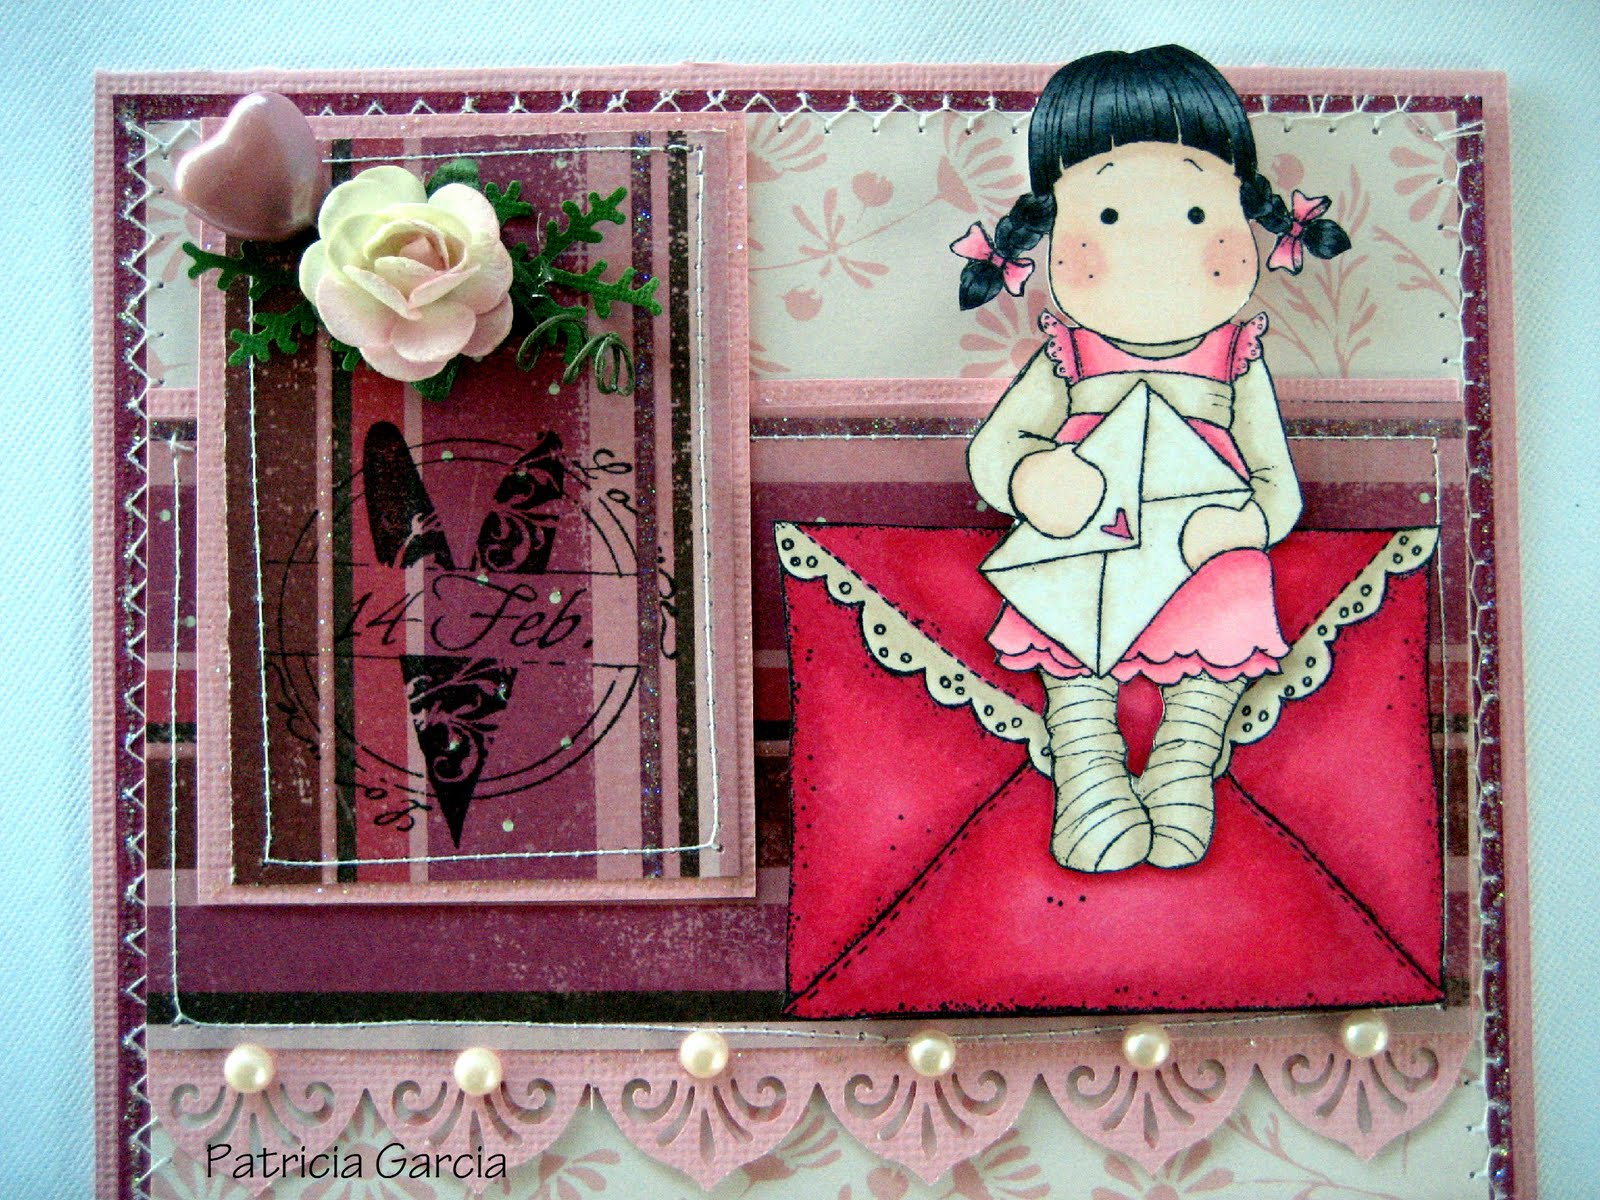 [Tilda+with+Letter+sitting+on+Love+Envelope+2]